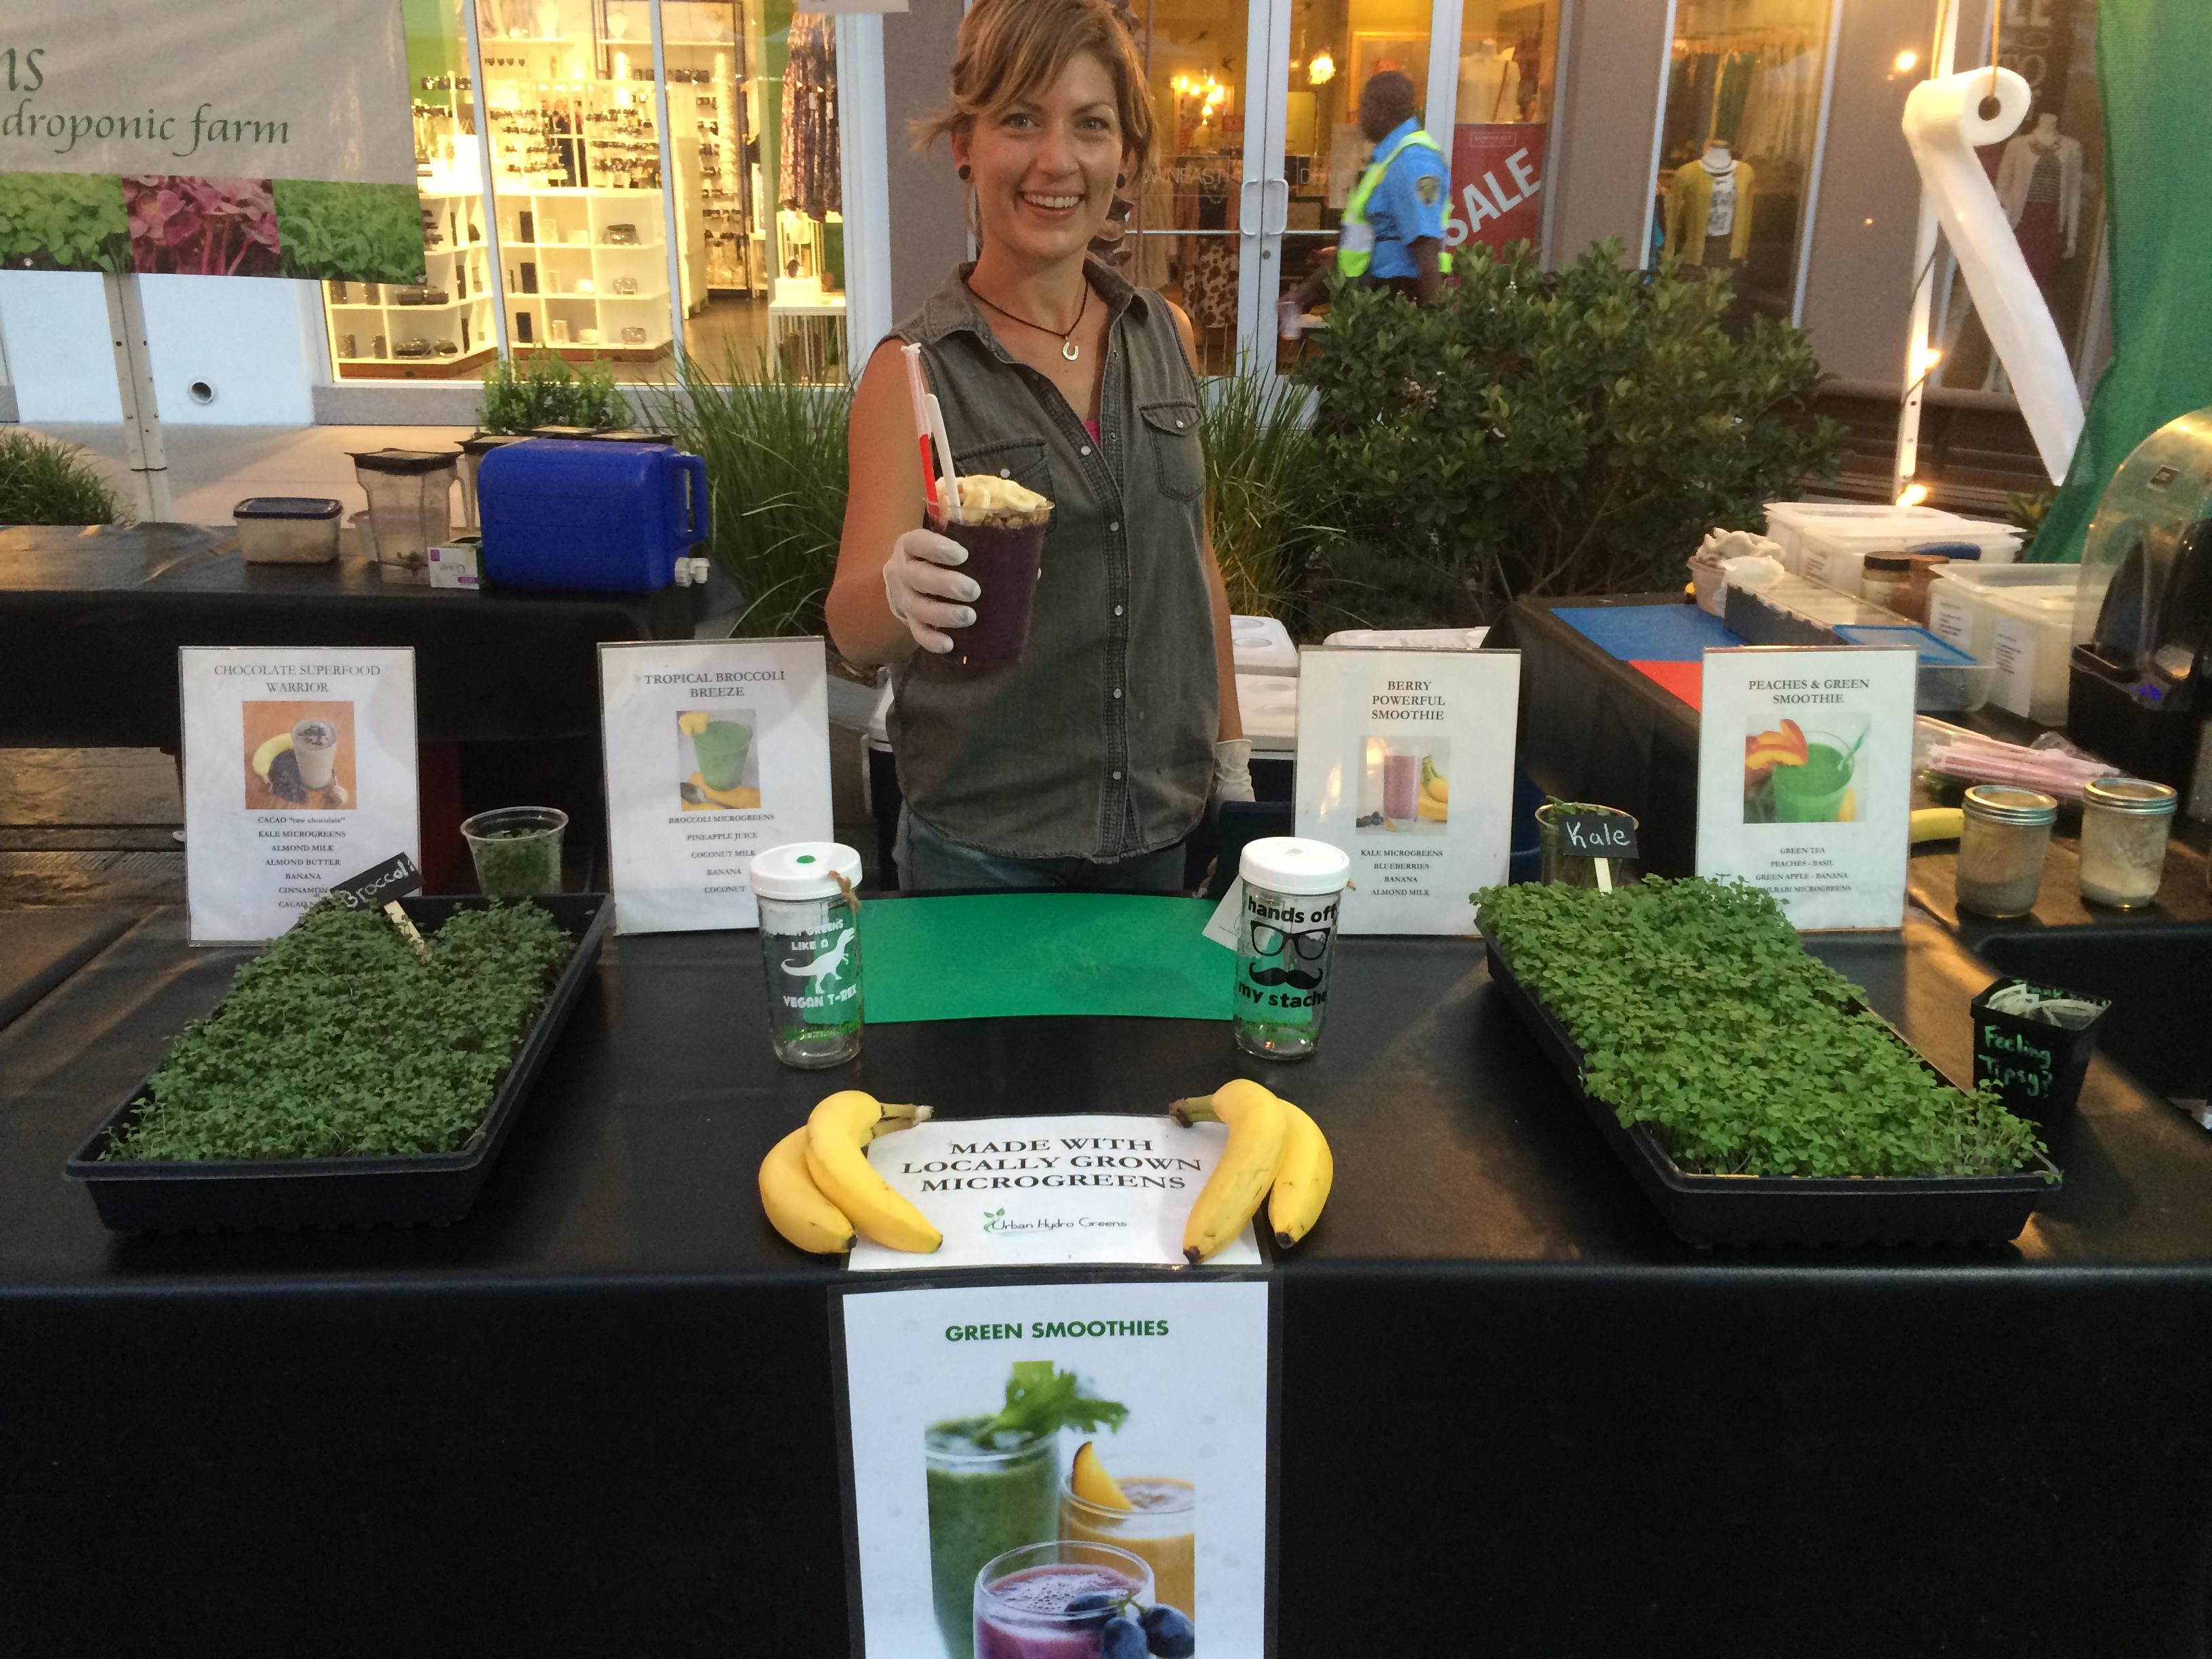 Microgreens smoothies made fresh